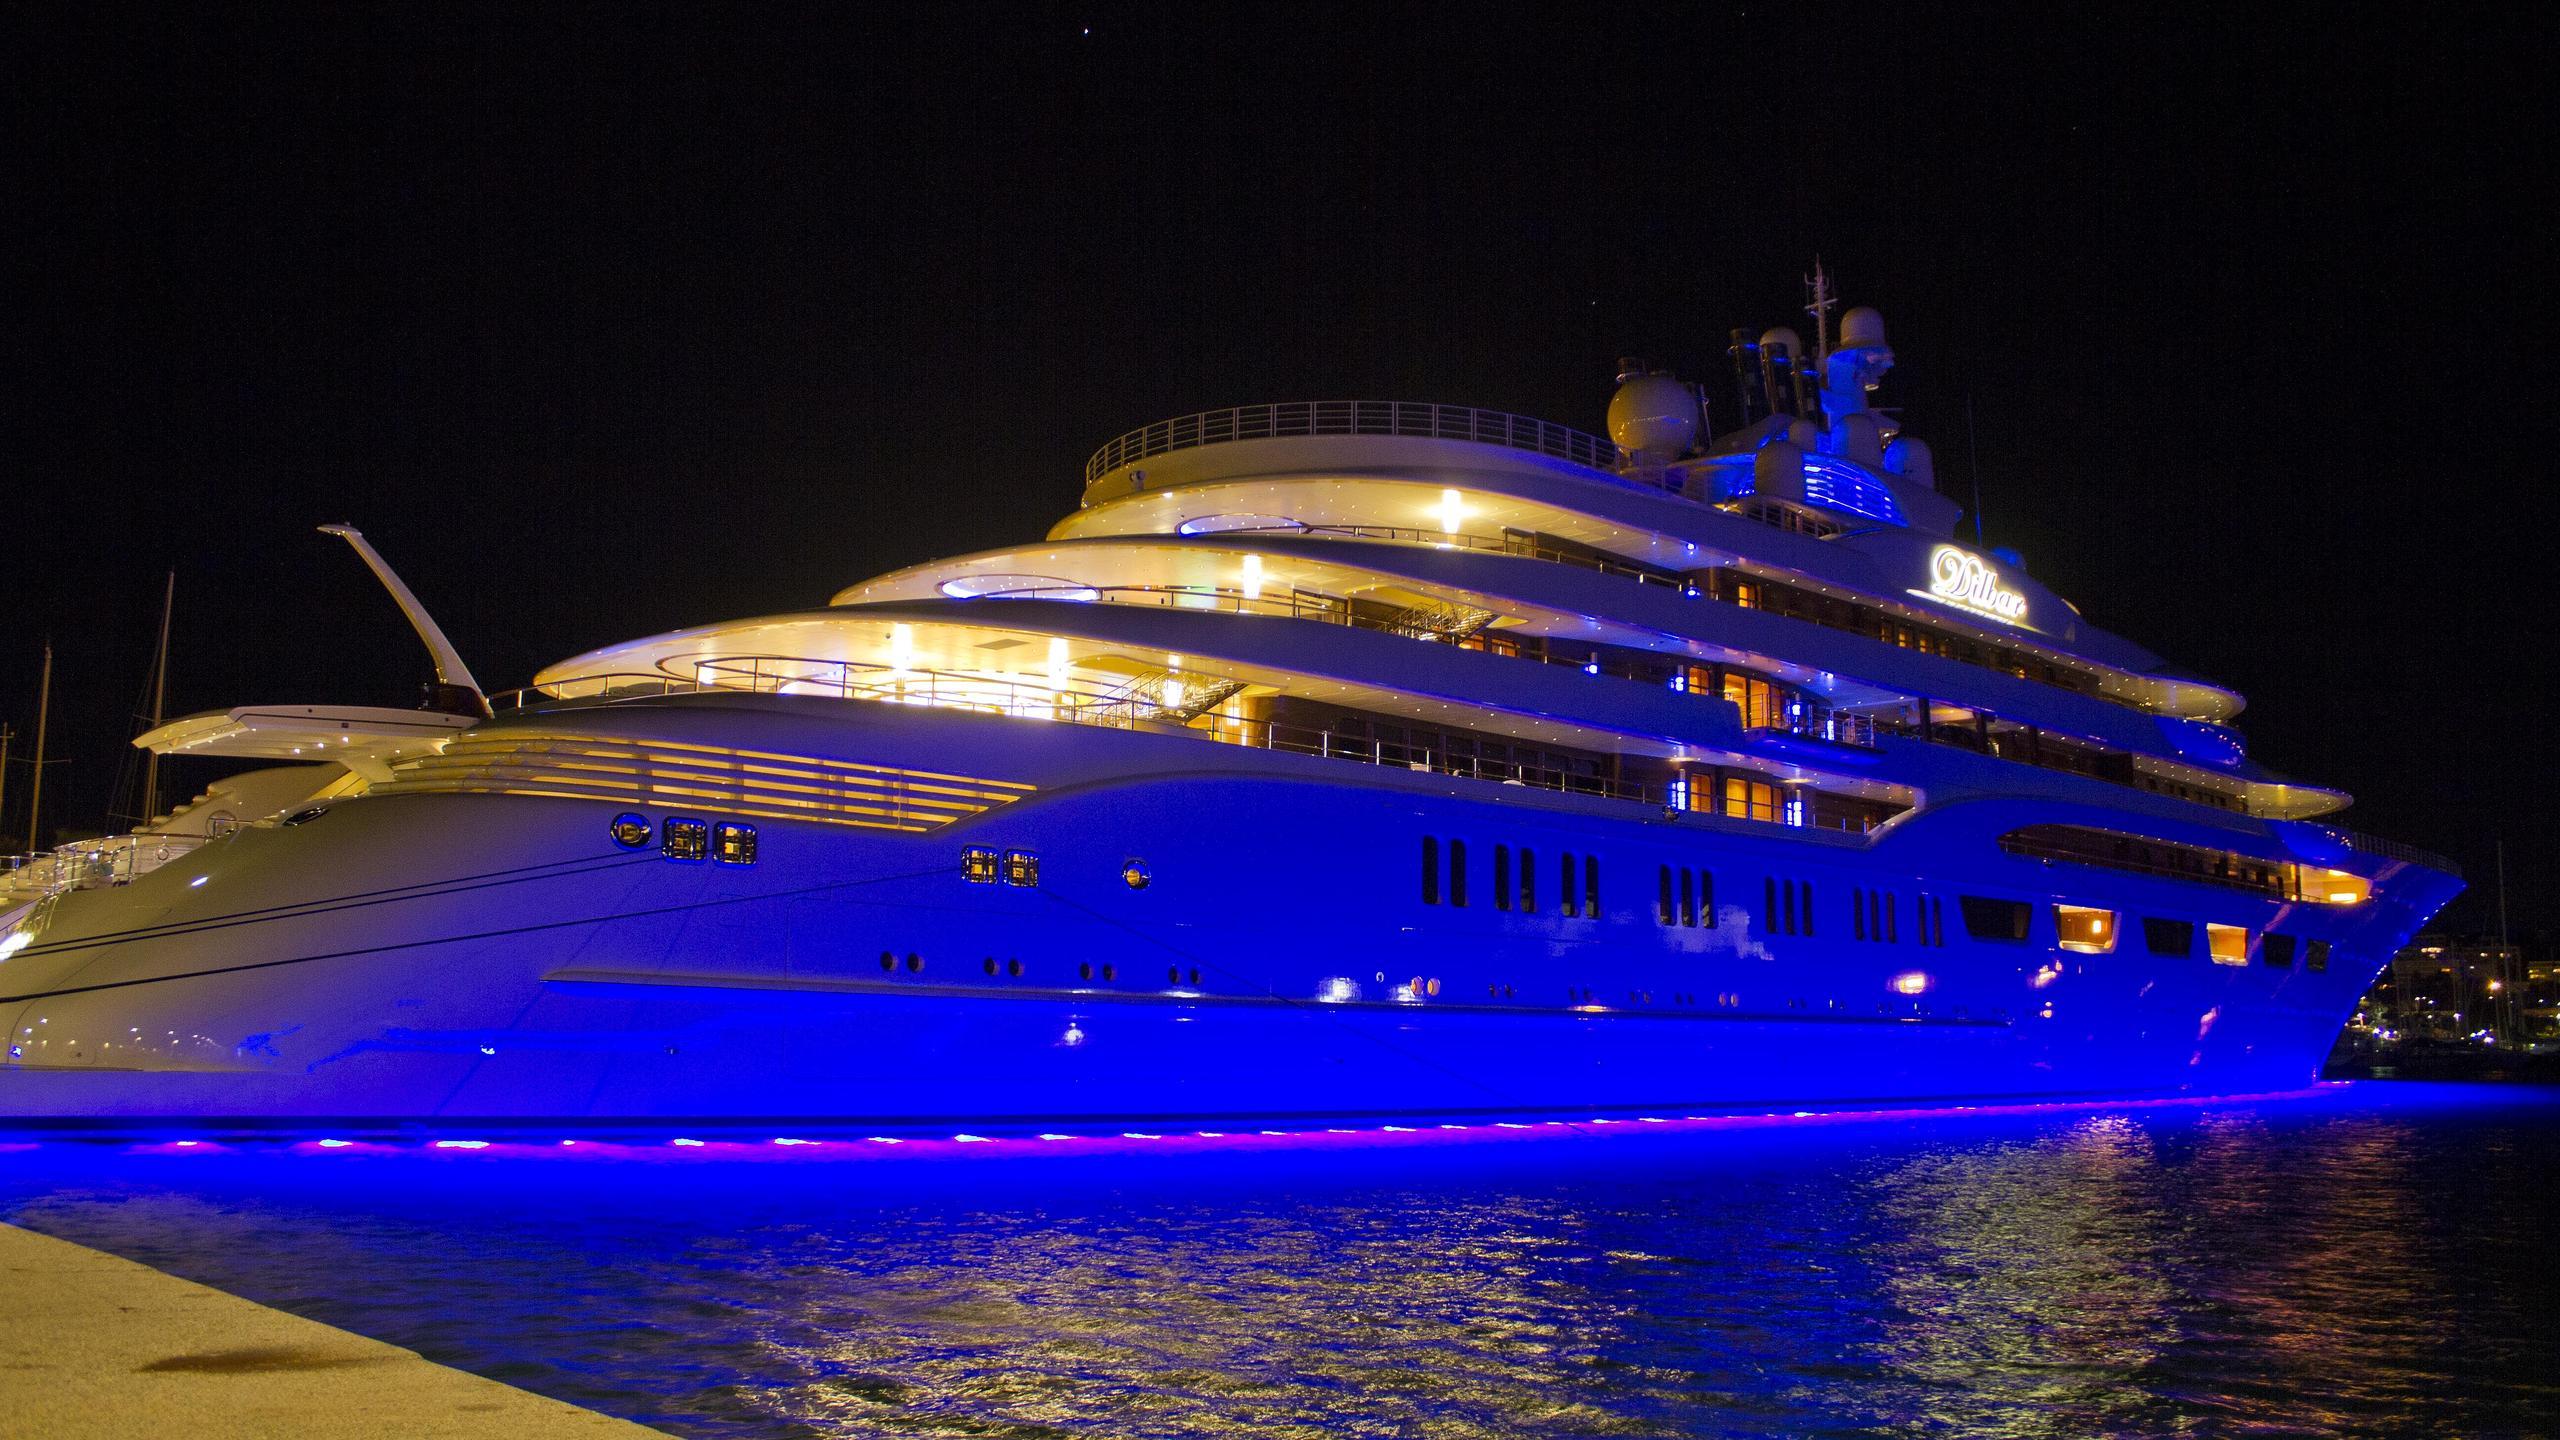 dilbar-motor-yacht-lurssen-2016-156m-half-stern-by-night